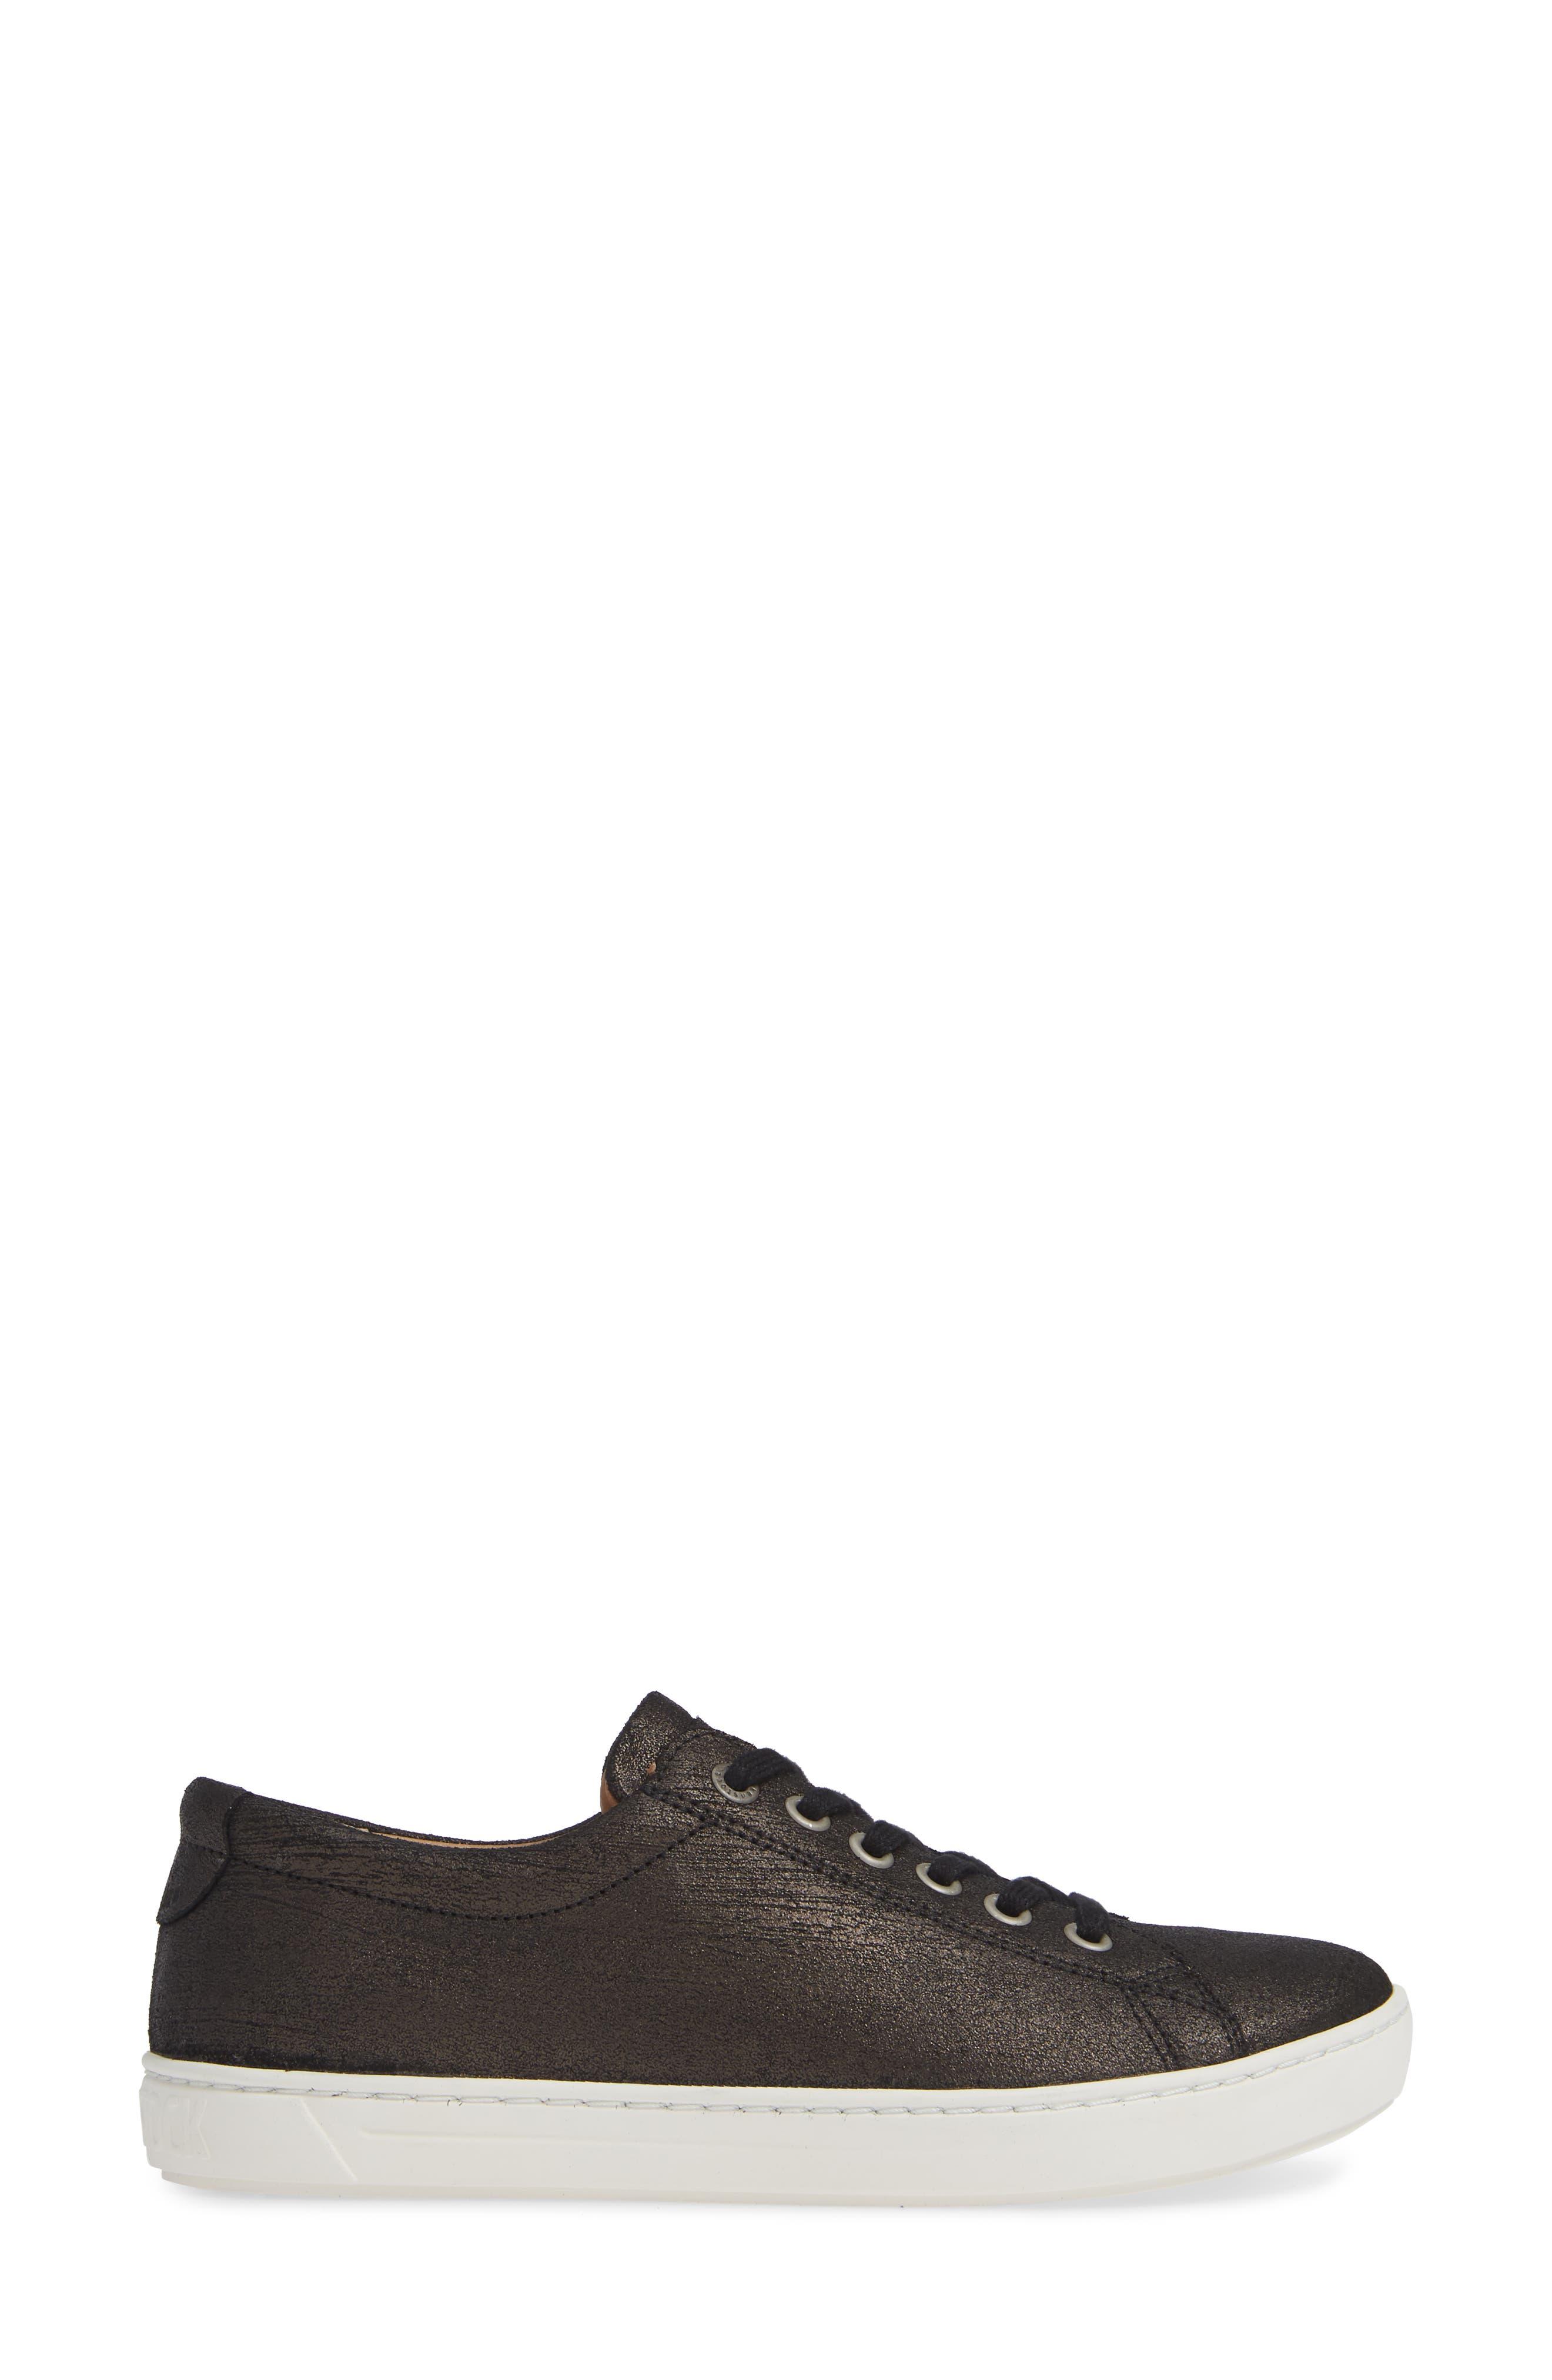 Arran Sneaker,                             Alternate thumbnail 3, color,                             METALLIC BLACK